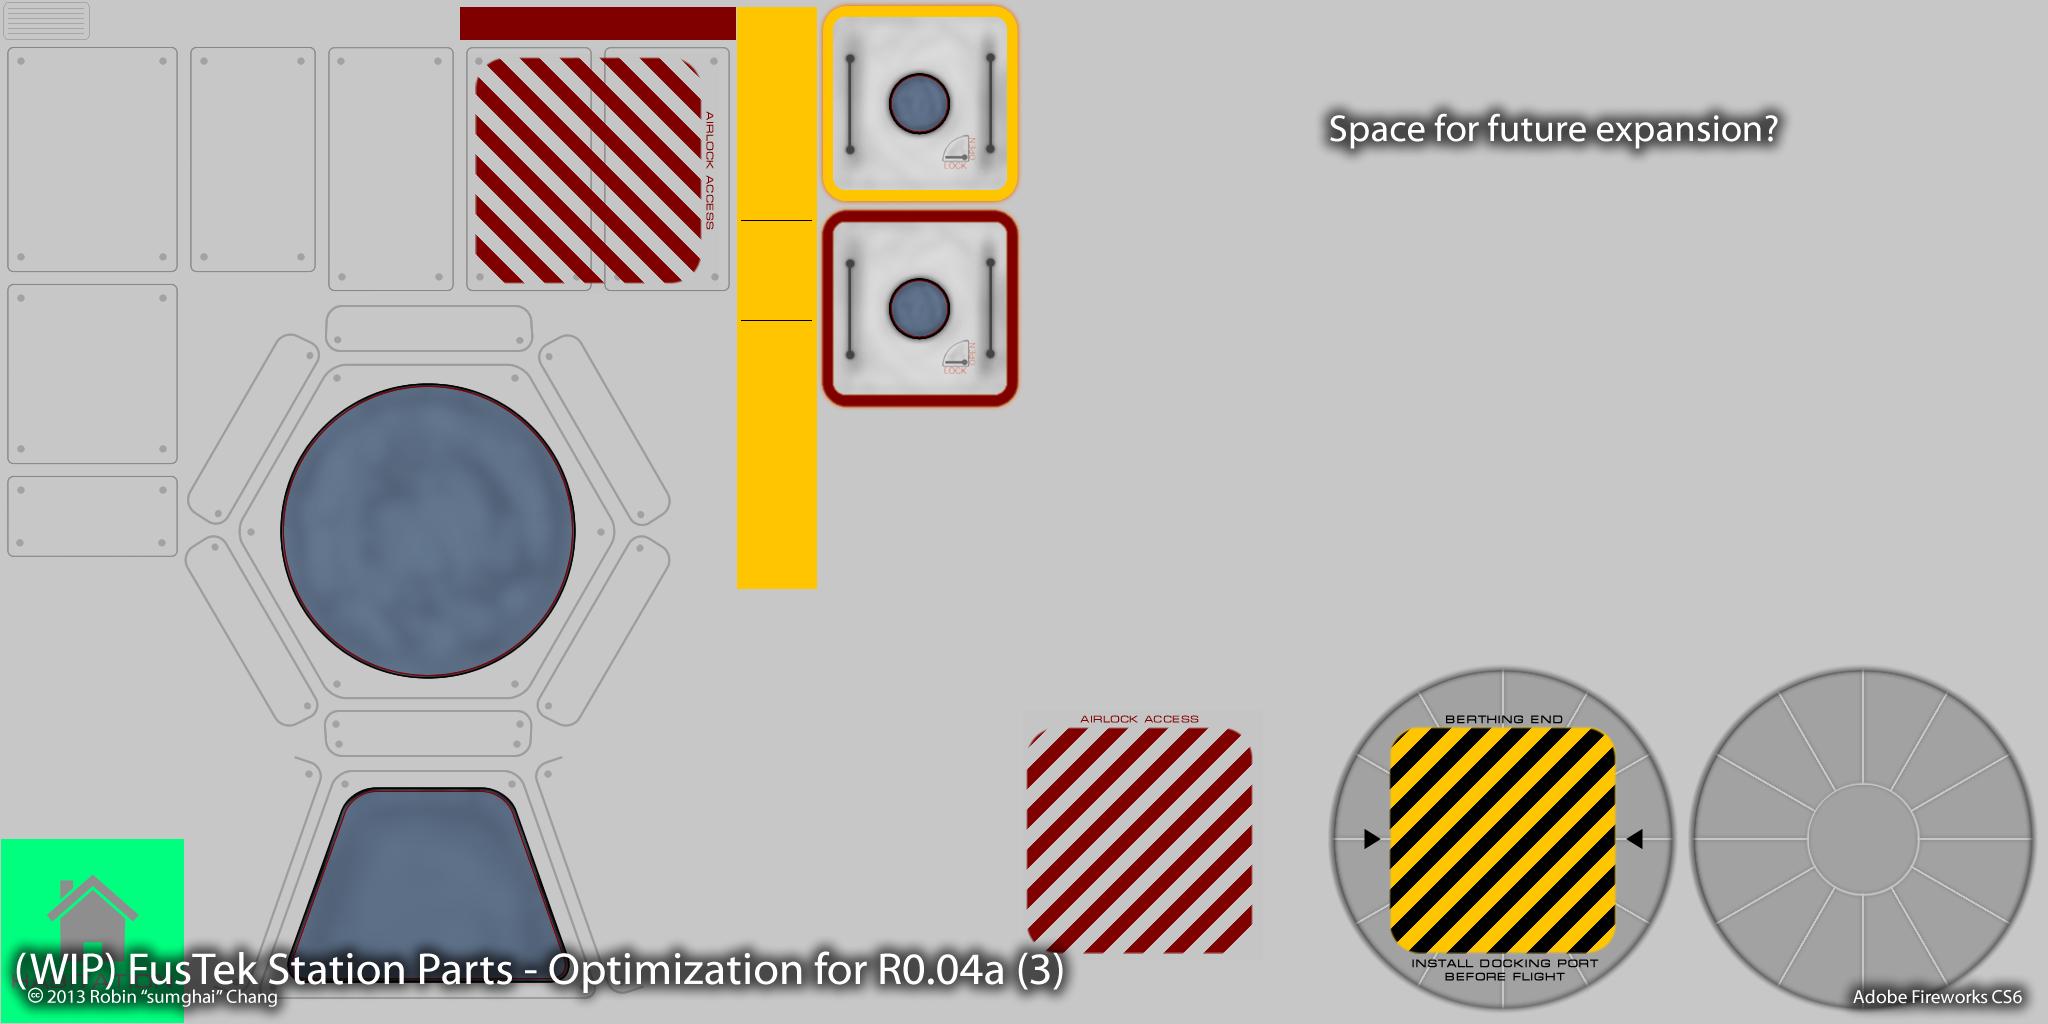 ksp_fustek_optimization_wip_20_oct_2013_3_by_sumghai-d6r4p5f.png